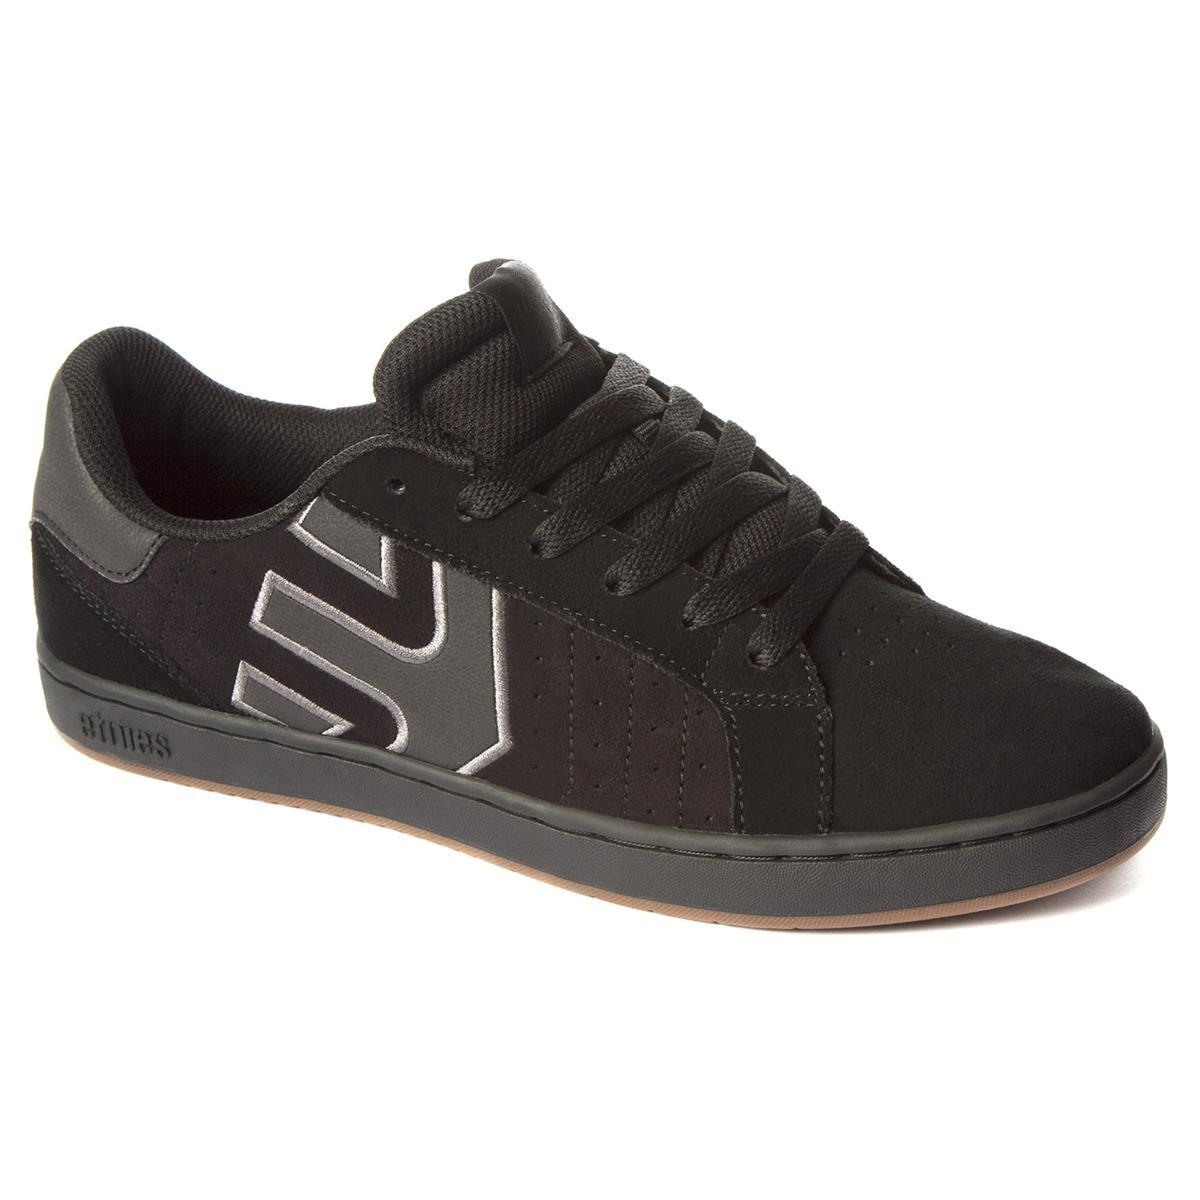 Etnies Fader Shoes White Dark Grey